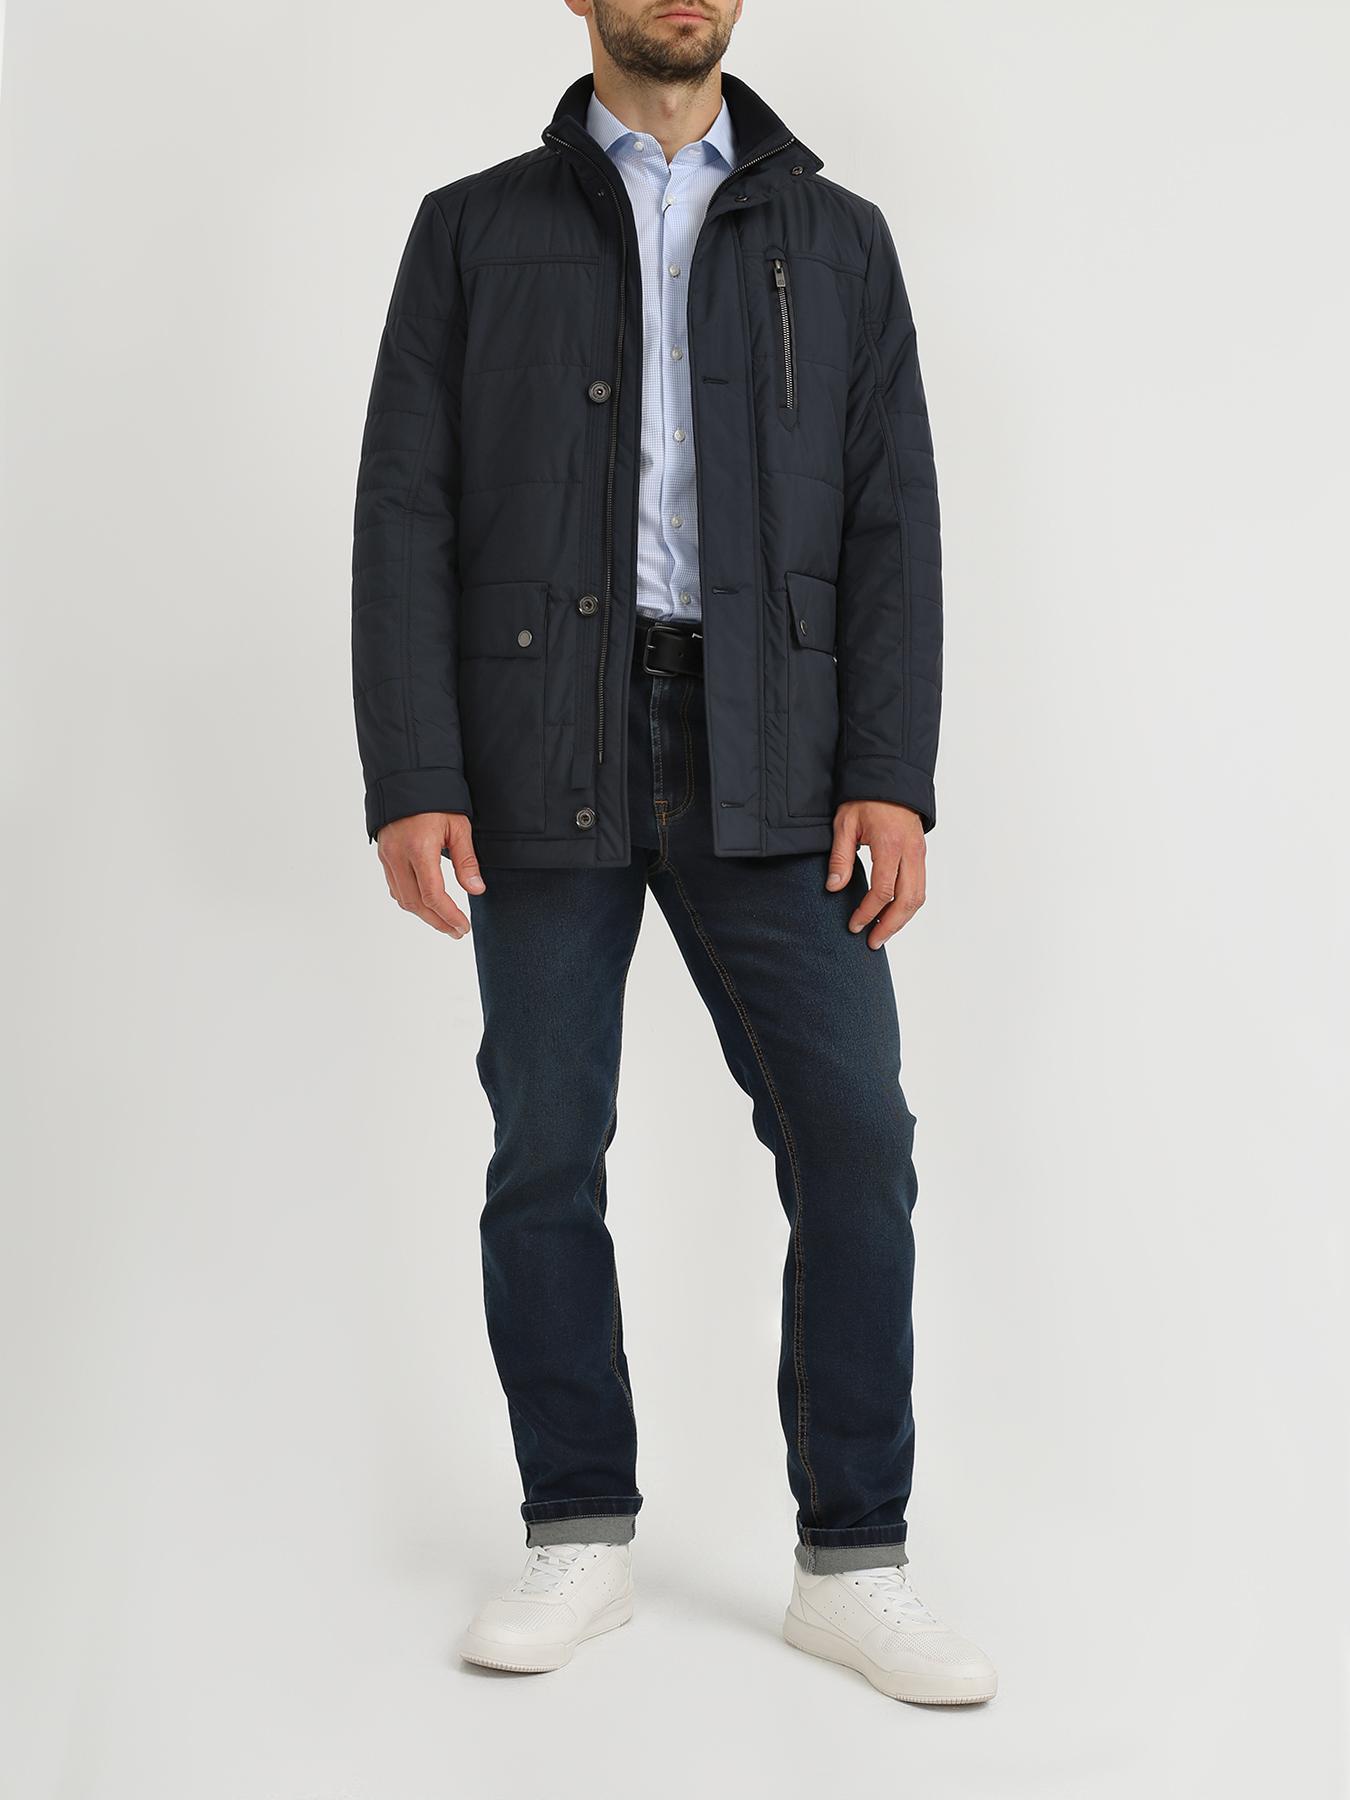 Alessandro Manzoni Мужская куртка фото